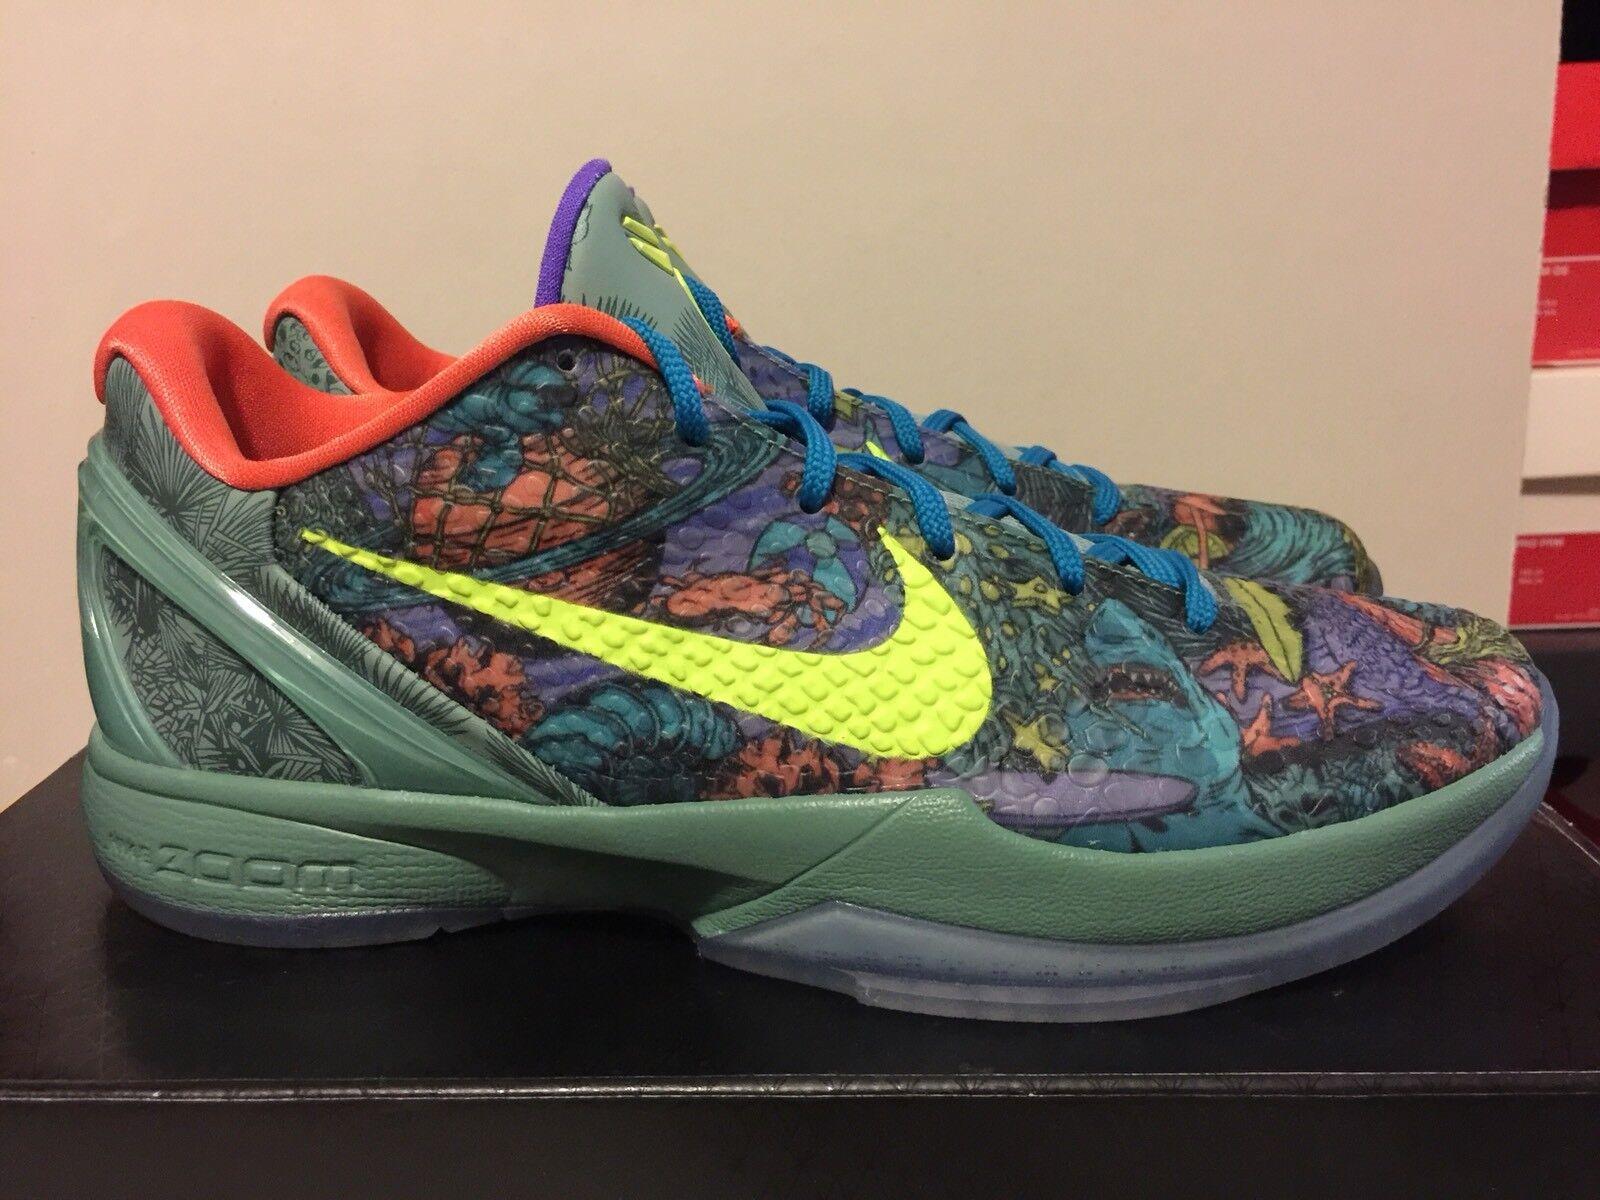 Nike Zoom KOBE VI 6 PRELUDE CANNON GREEN VOLT orange BLACK blueE 429913-008 Sz11